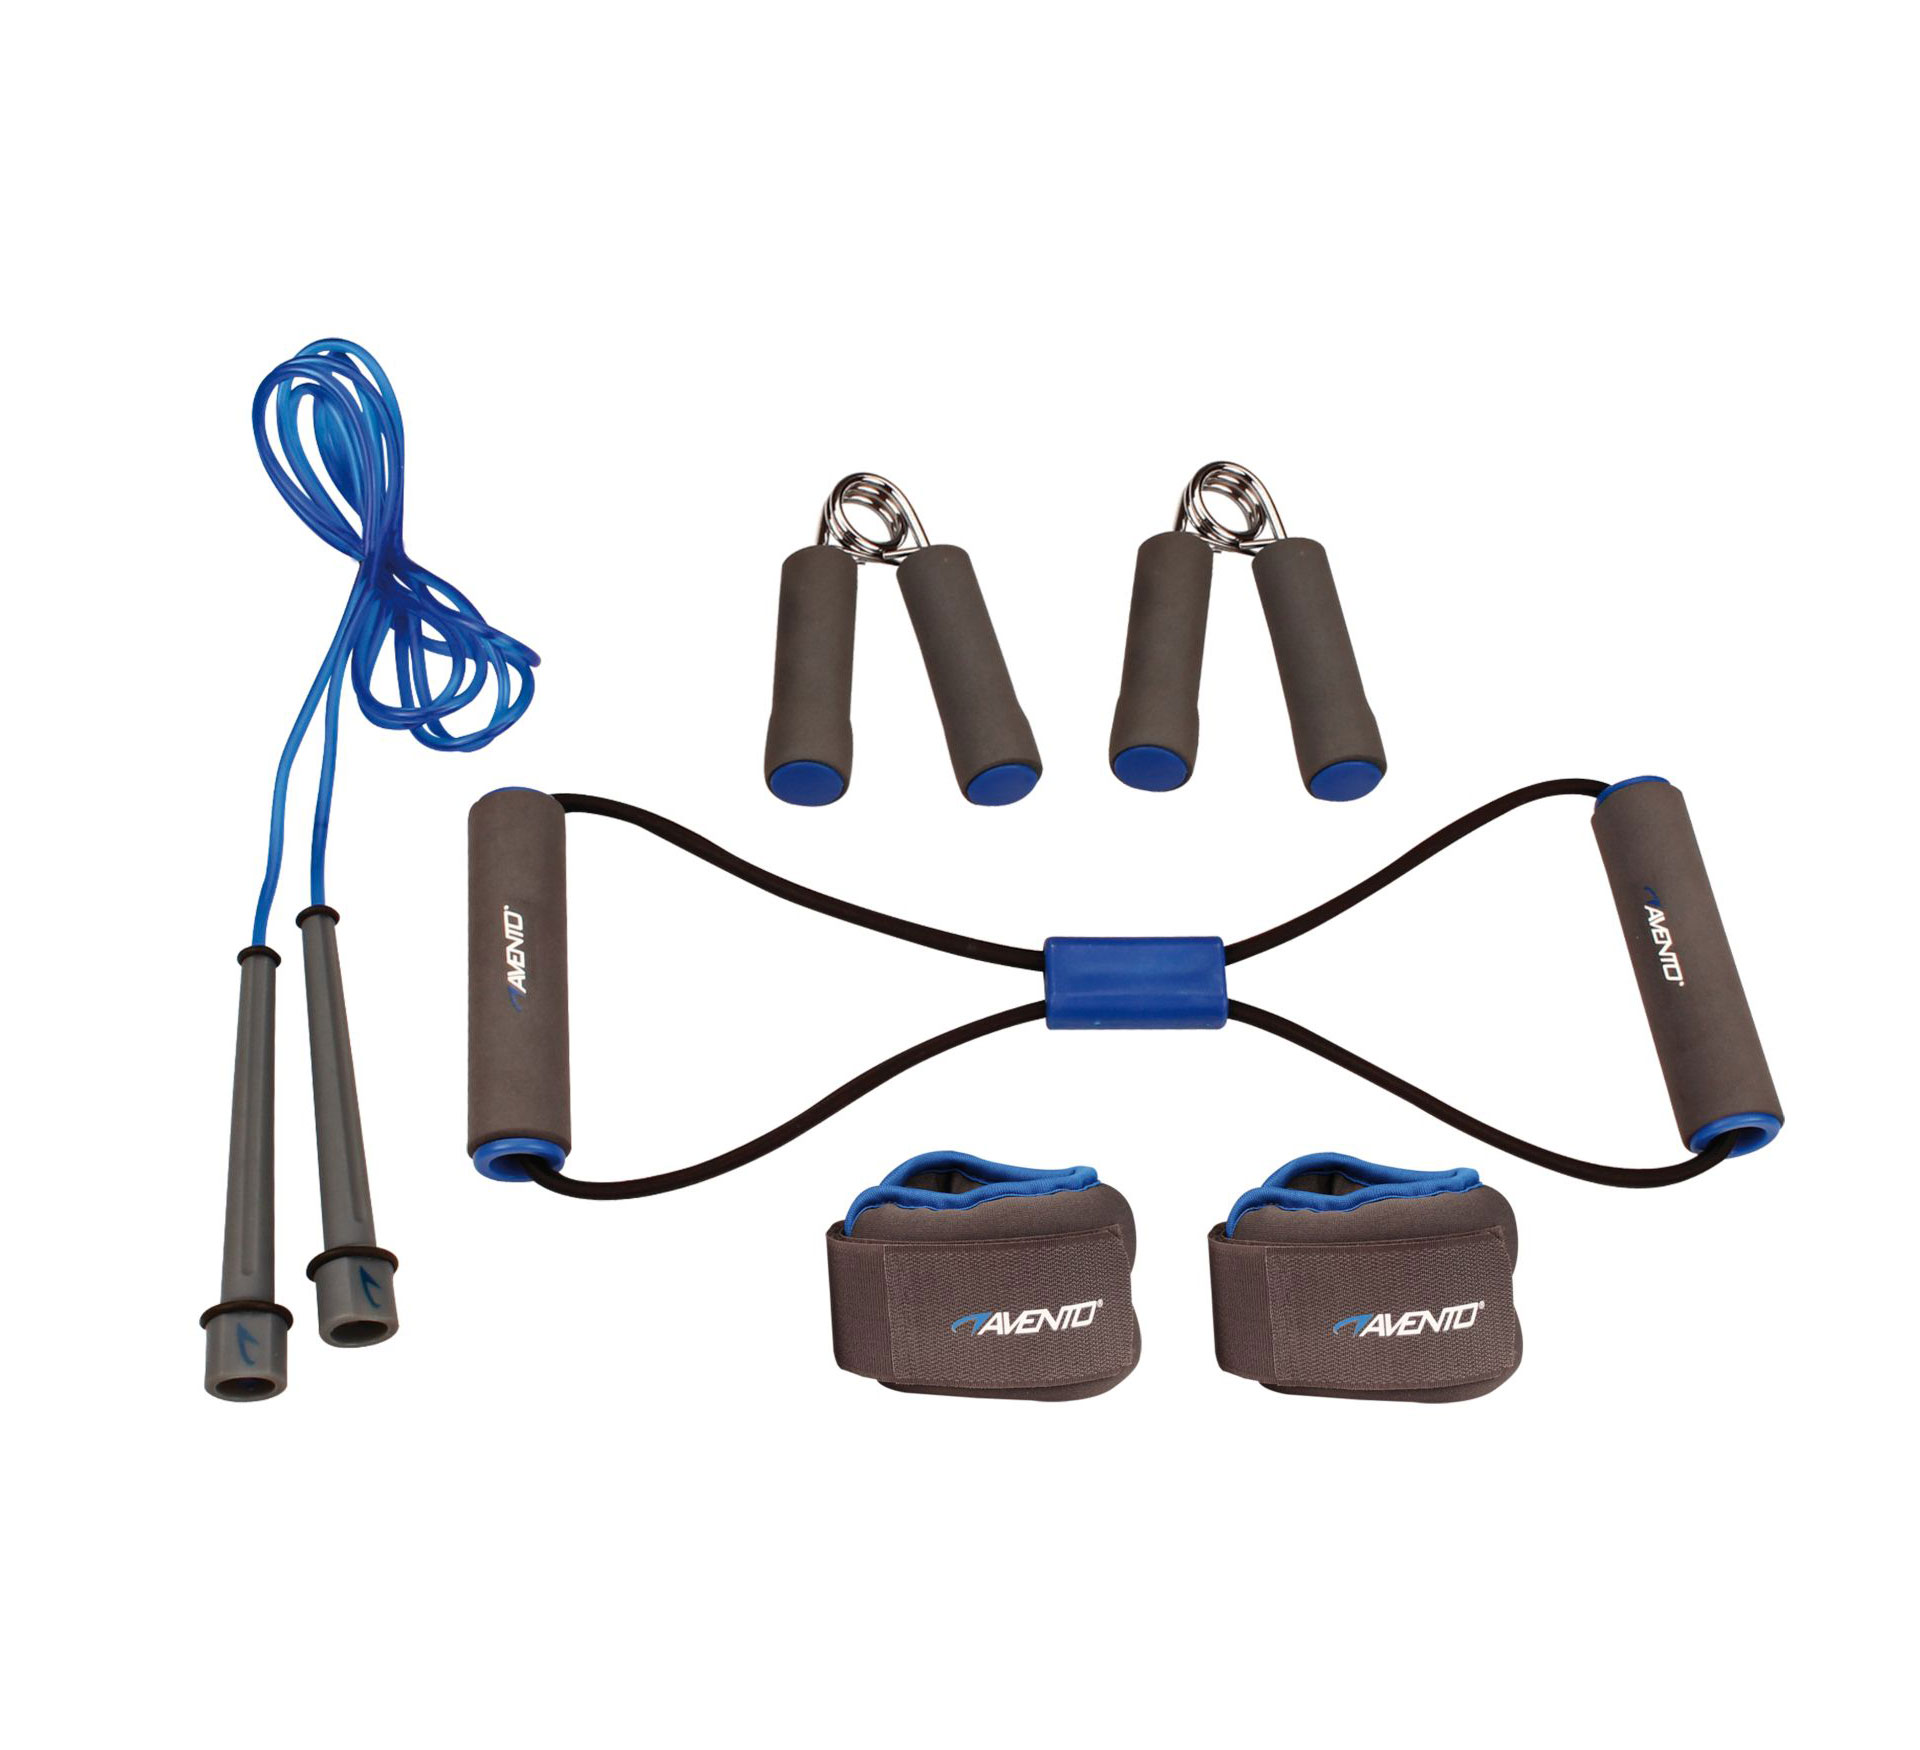 Avento  Fitness Set 6-delig grijs - blauw - zwart